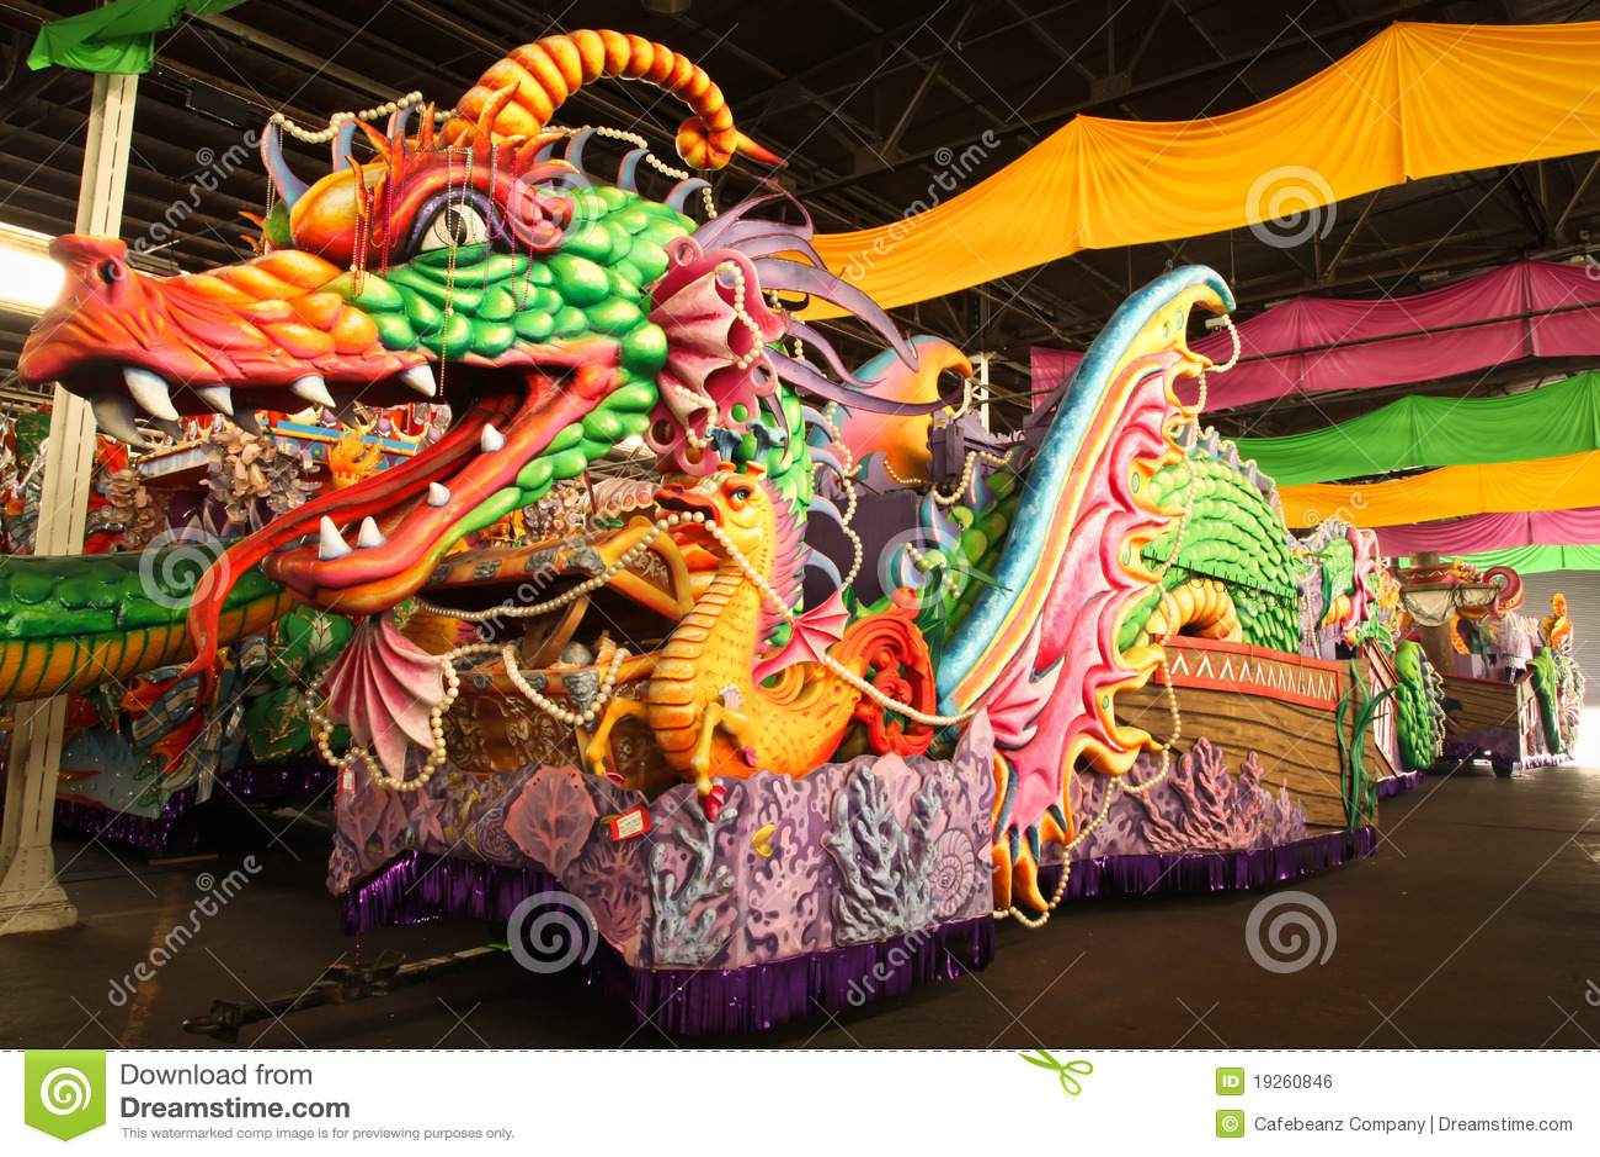 Mardi Gras Parade Float Royalty Free Stock Image Image